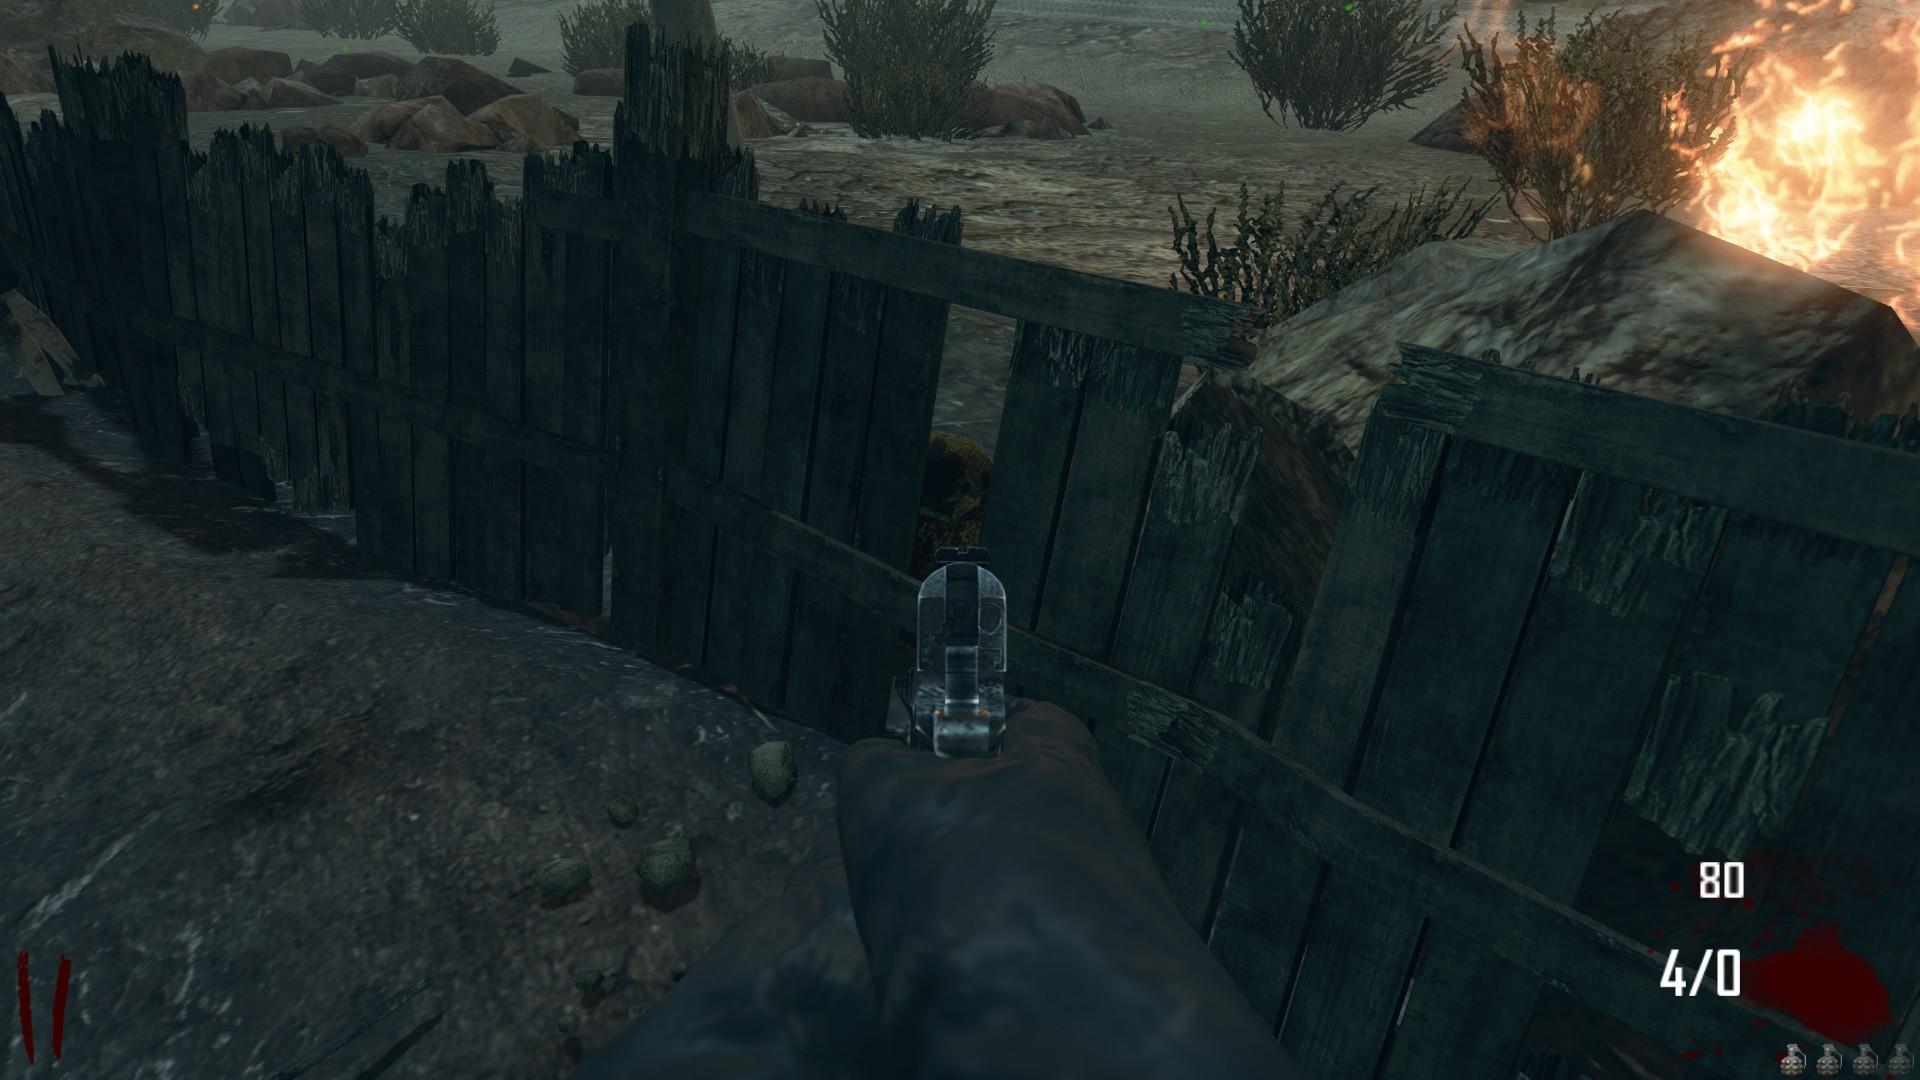 nuketown zombies main easter egg guide